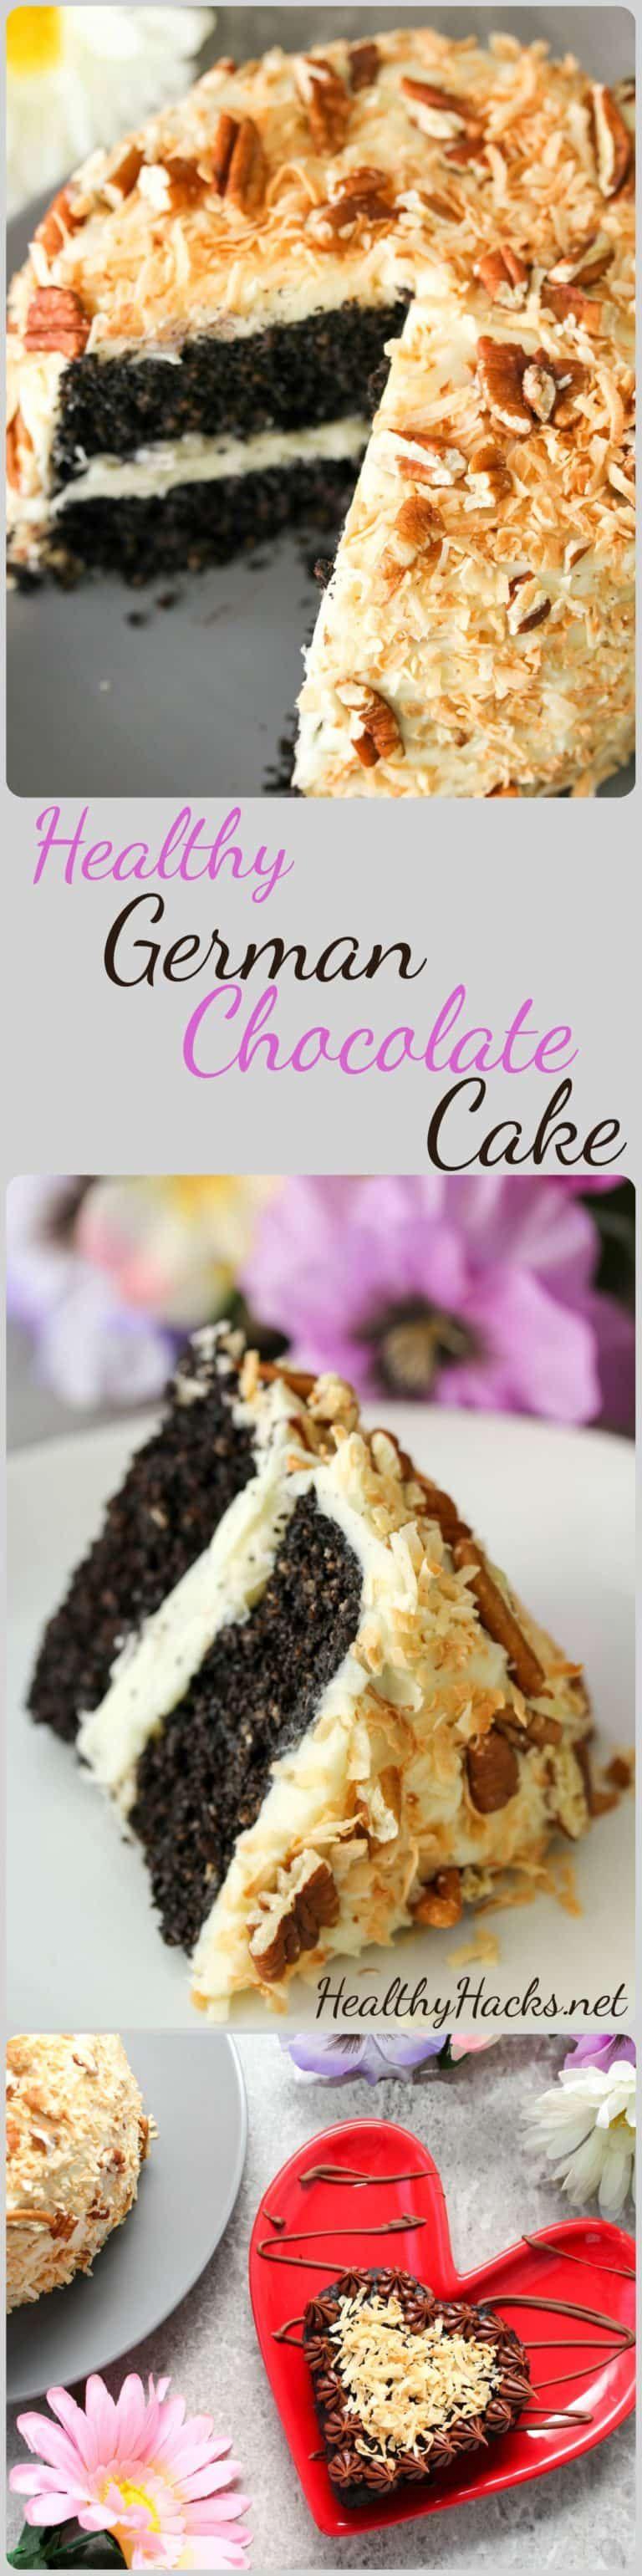 Healthy german chocolate cake vegan gluten free